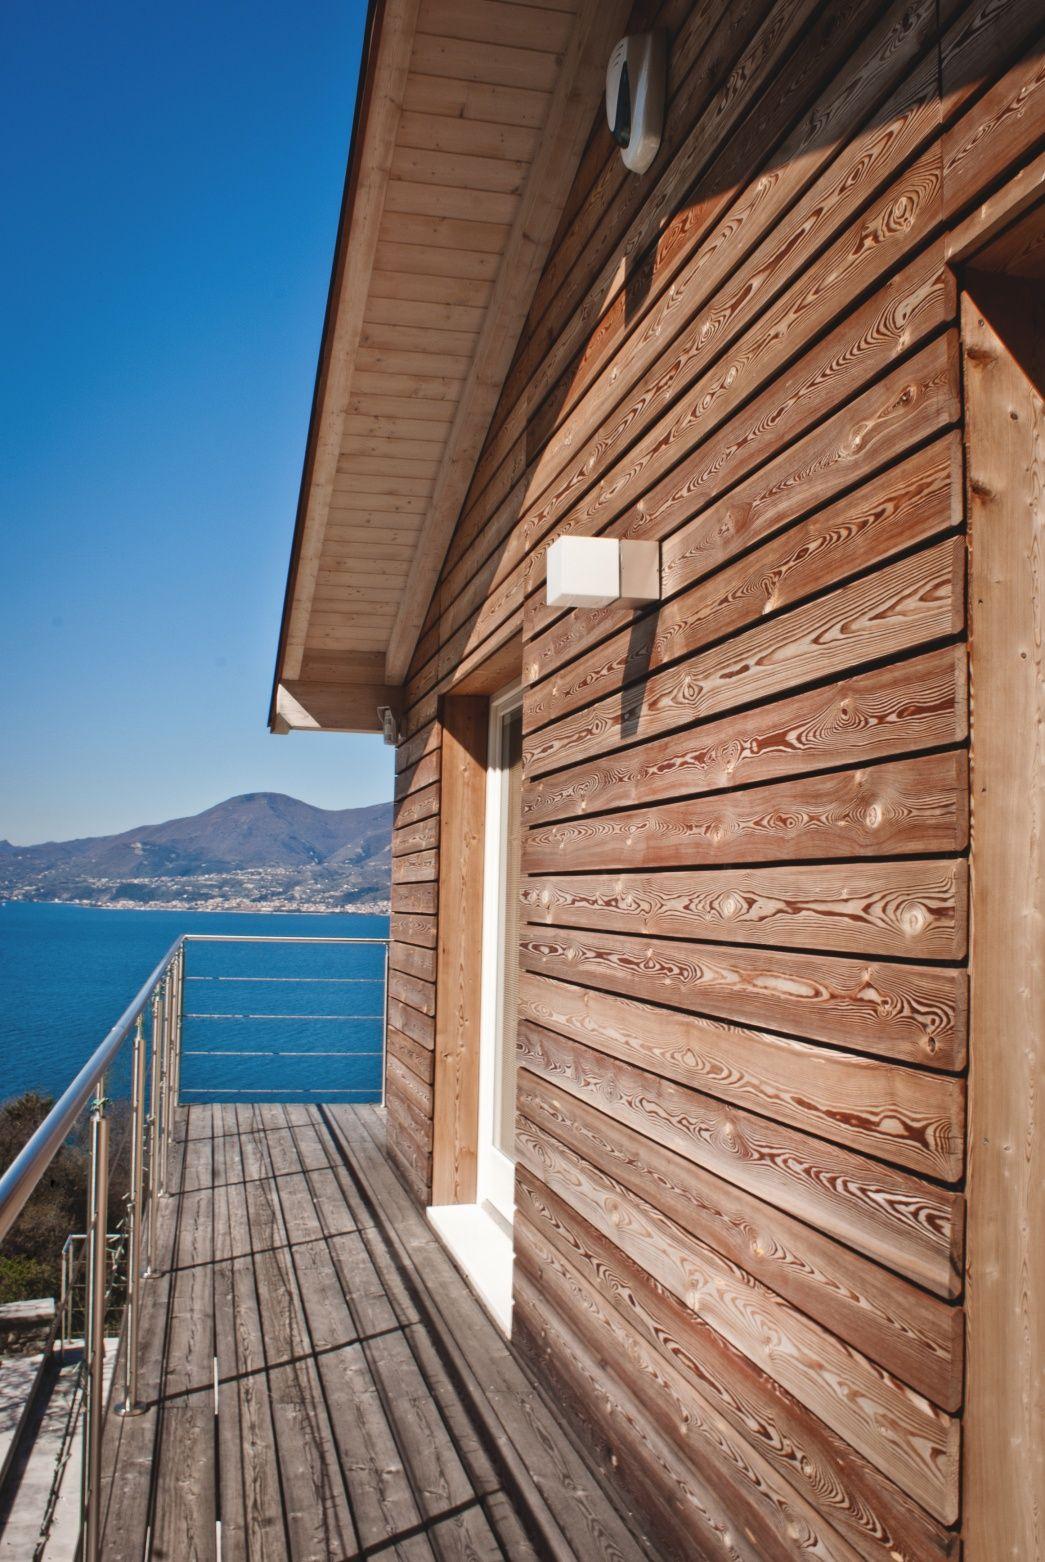 Casa prefabbricata in legno rivestimento in larice torri del benaco vr case - Legno per esterni ...